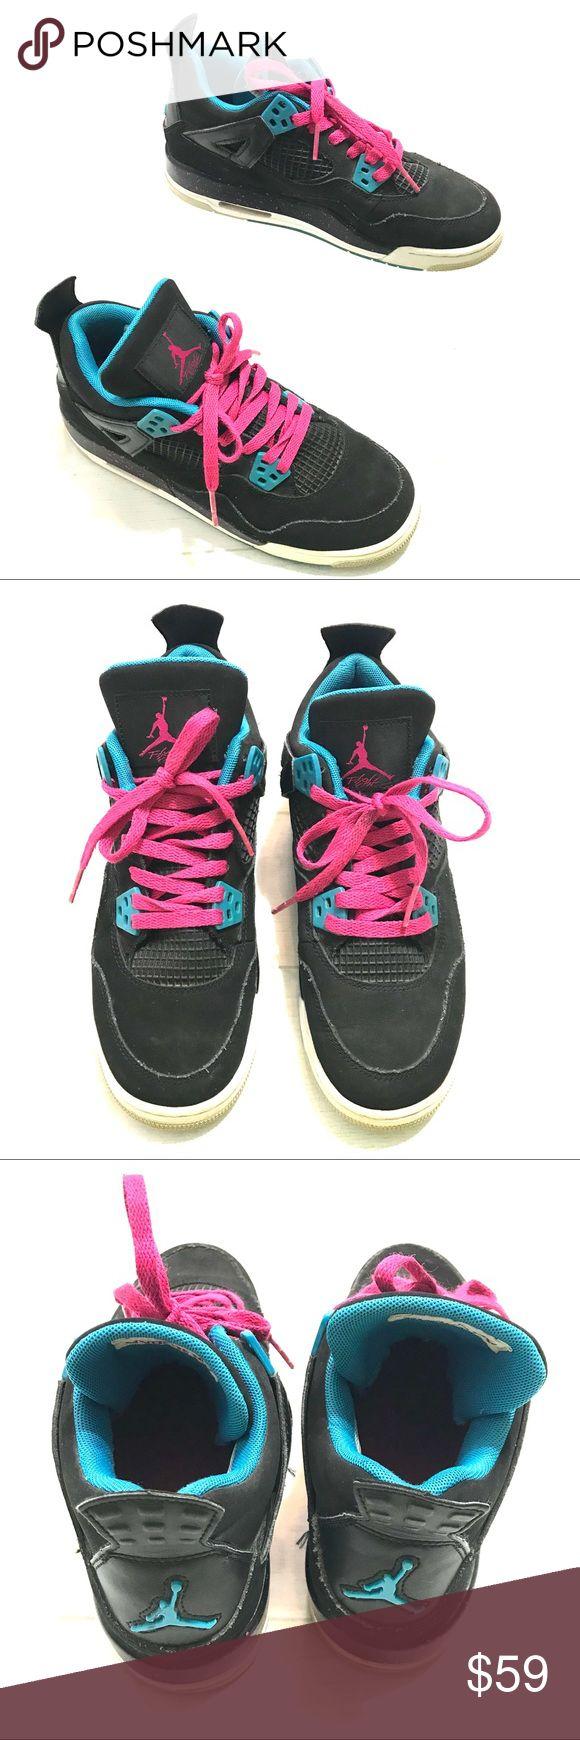 Jordan 1 Retro High Bred Toe (GS) Girls wearing jordans